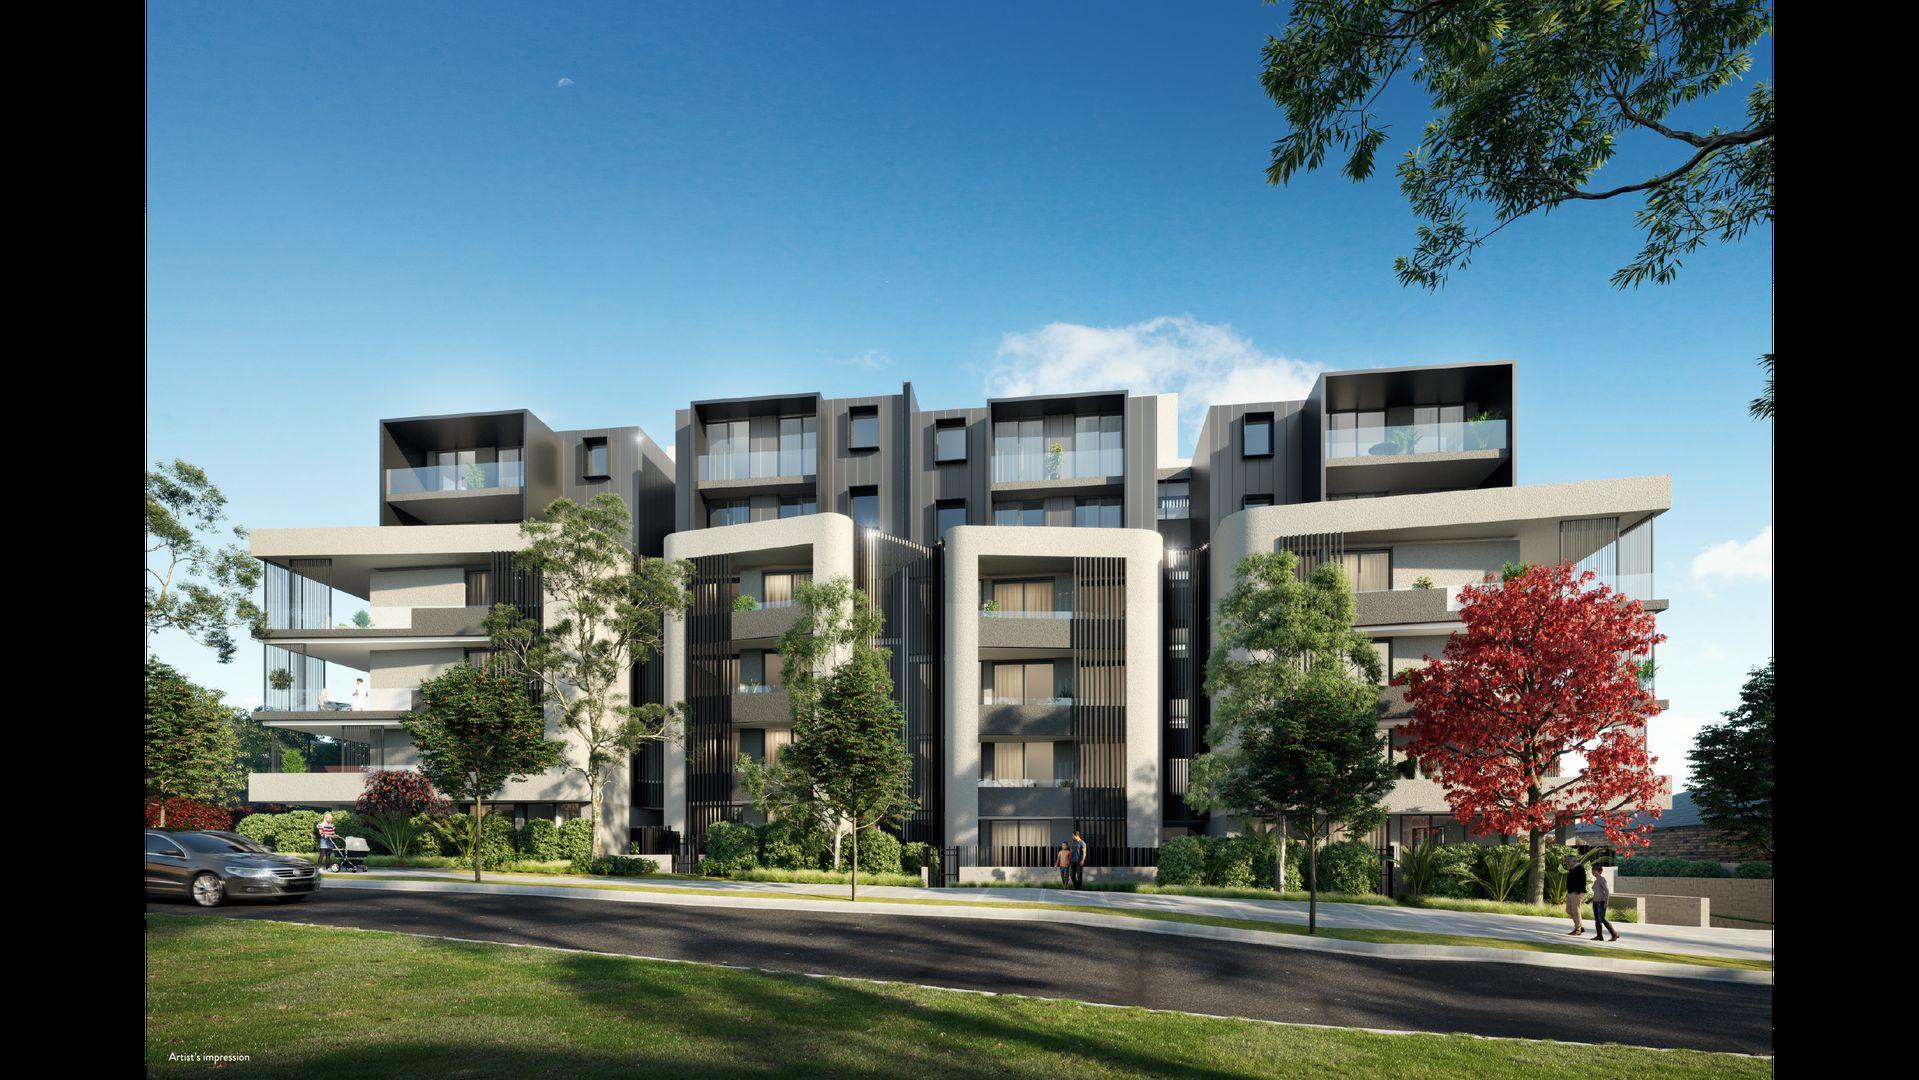 5-11 Wyuna Street, Beverley Park, NSW 2217, Image 0